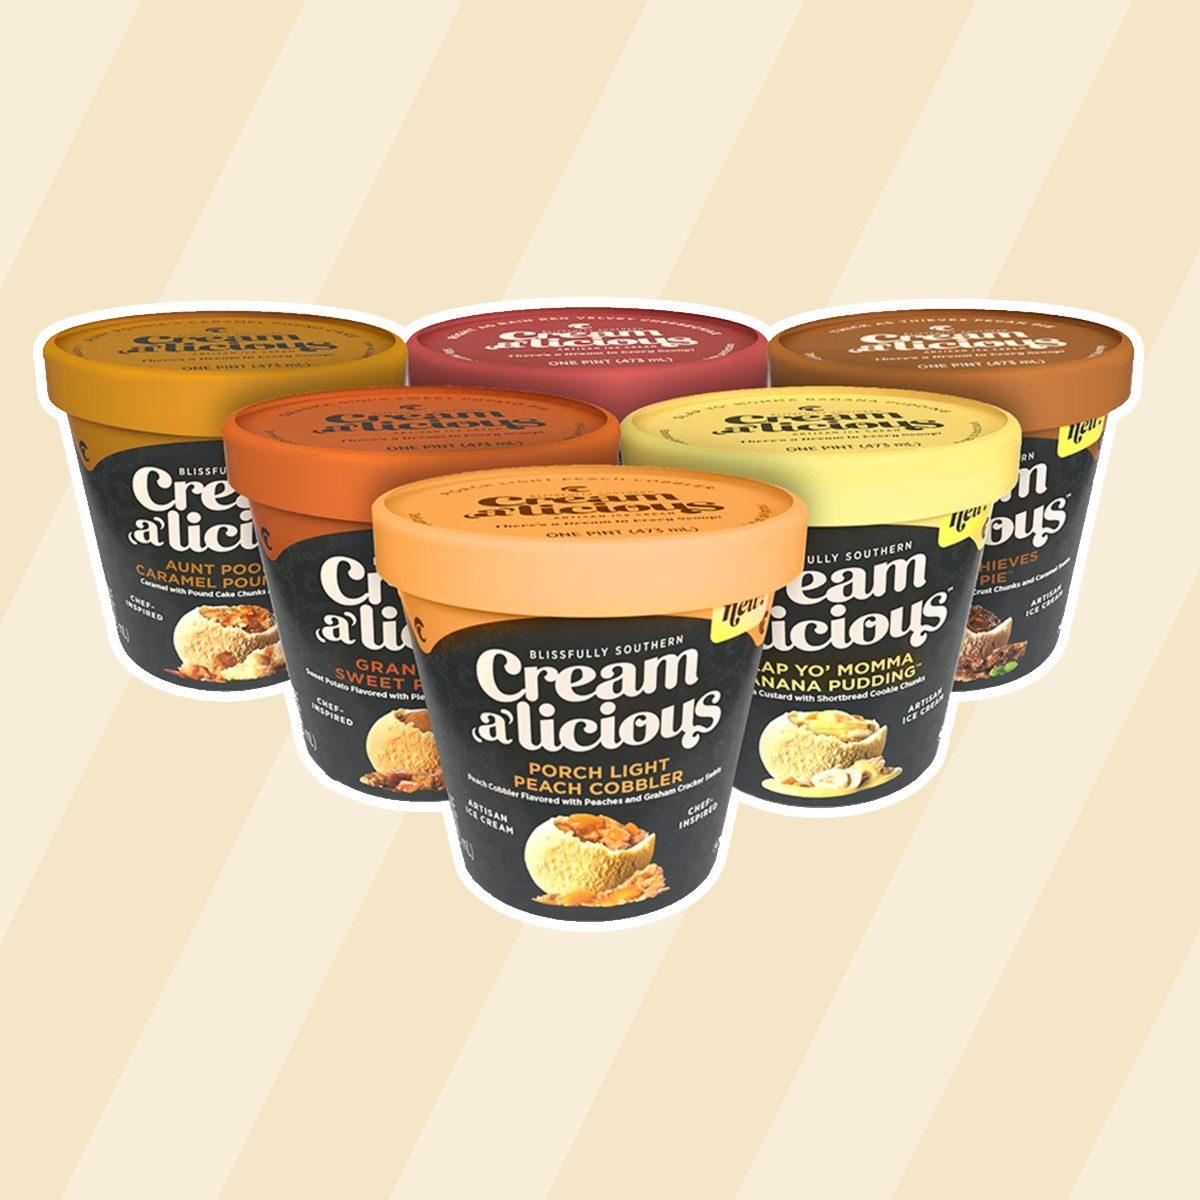 Creamalicious Ice Cream